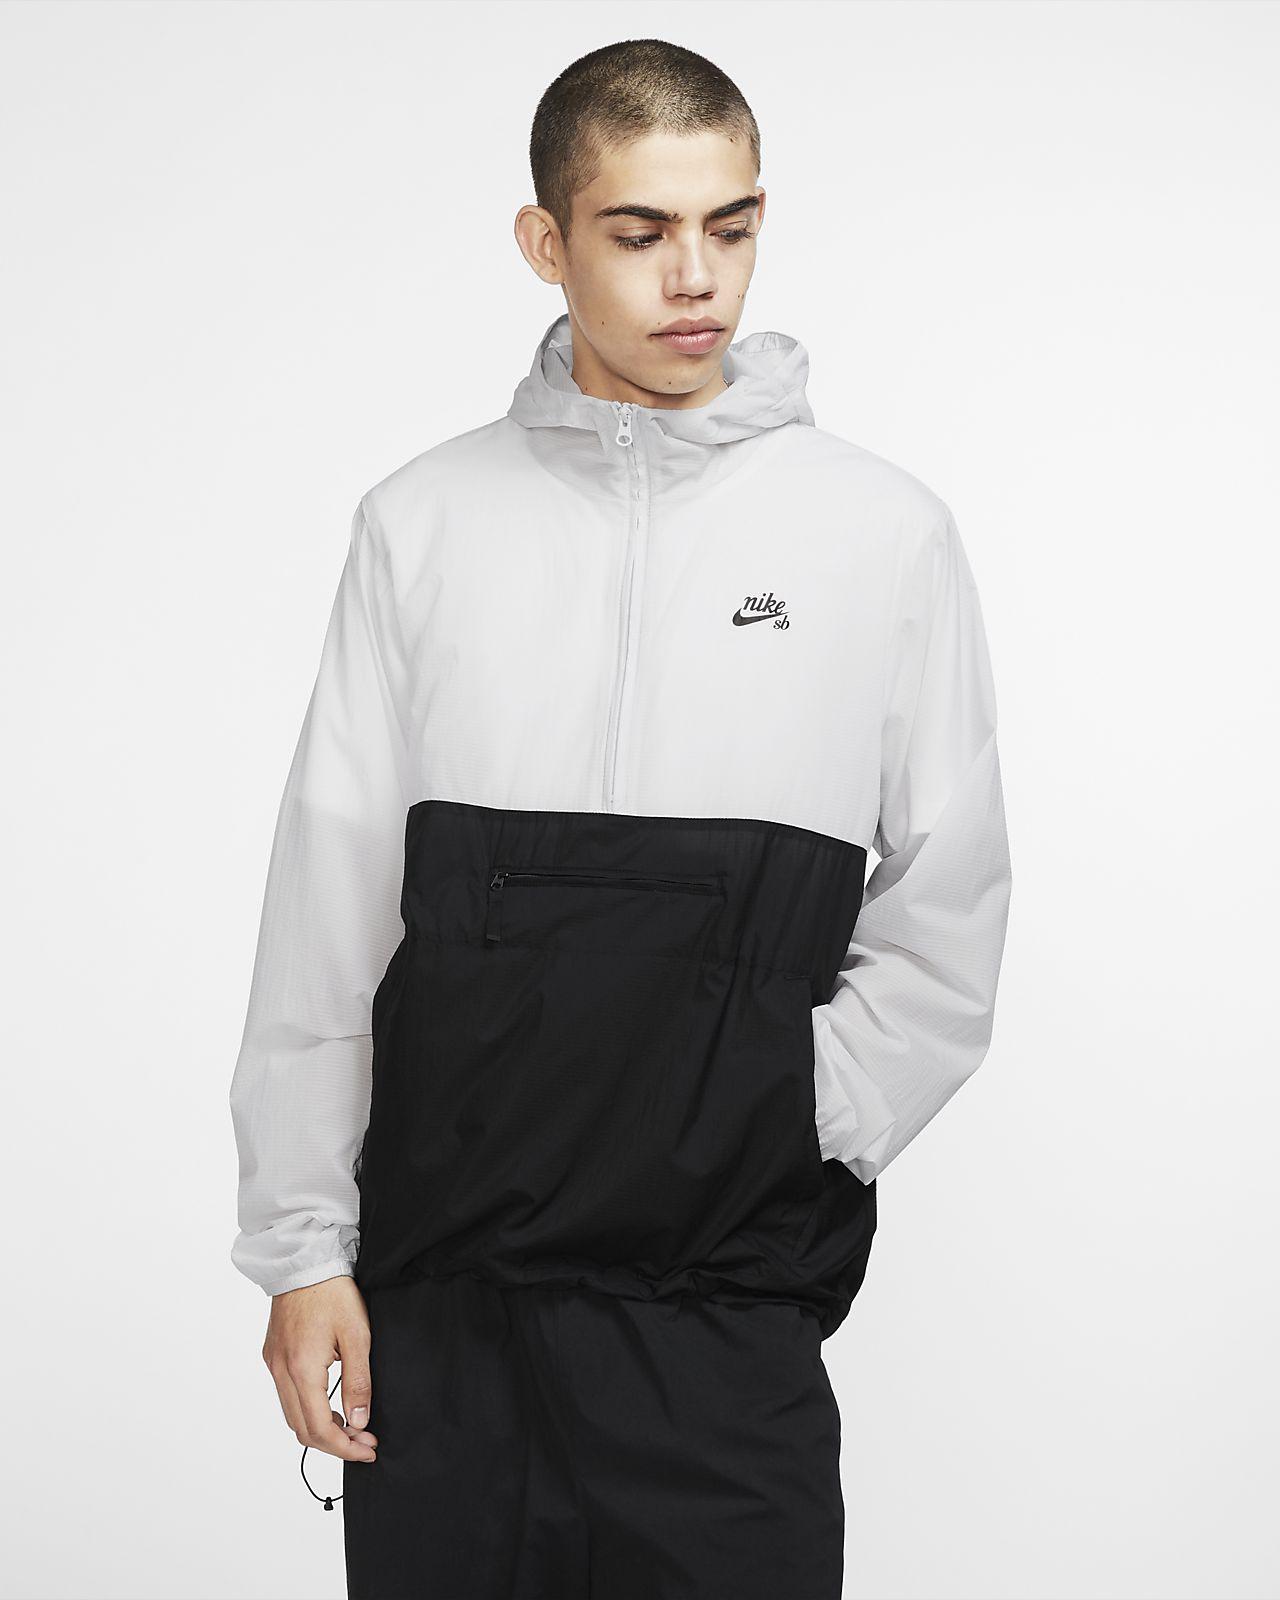 Nike SB-skateranorakjakke